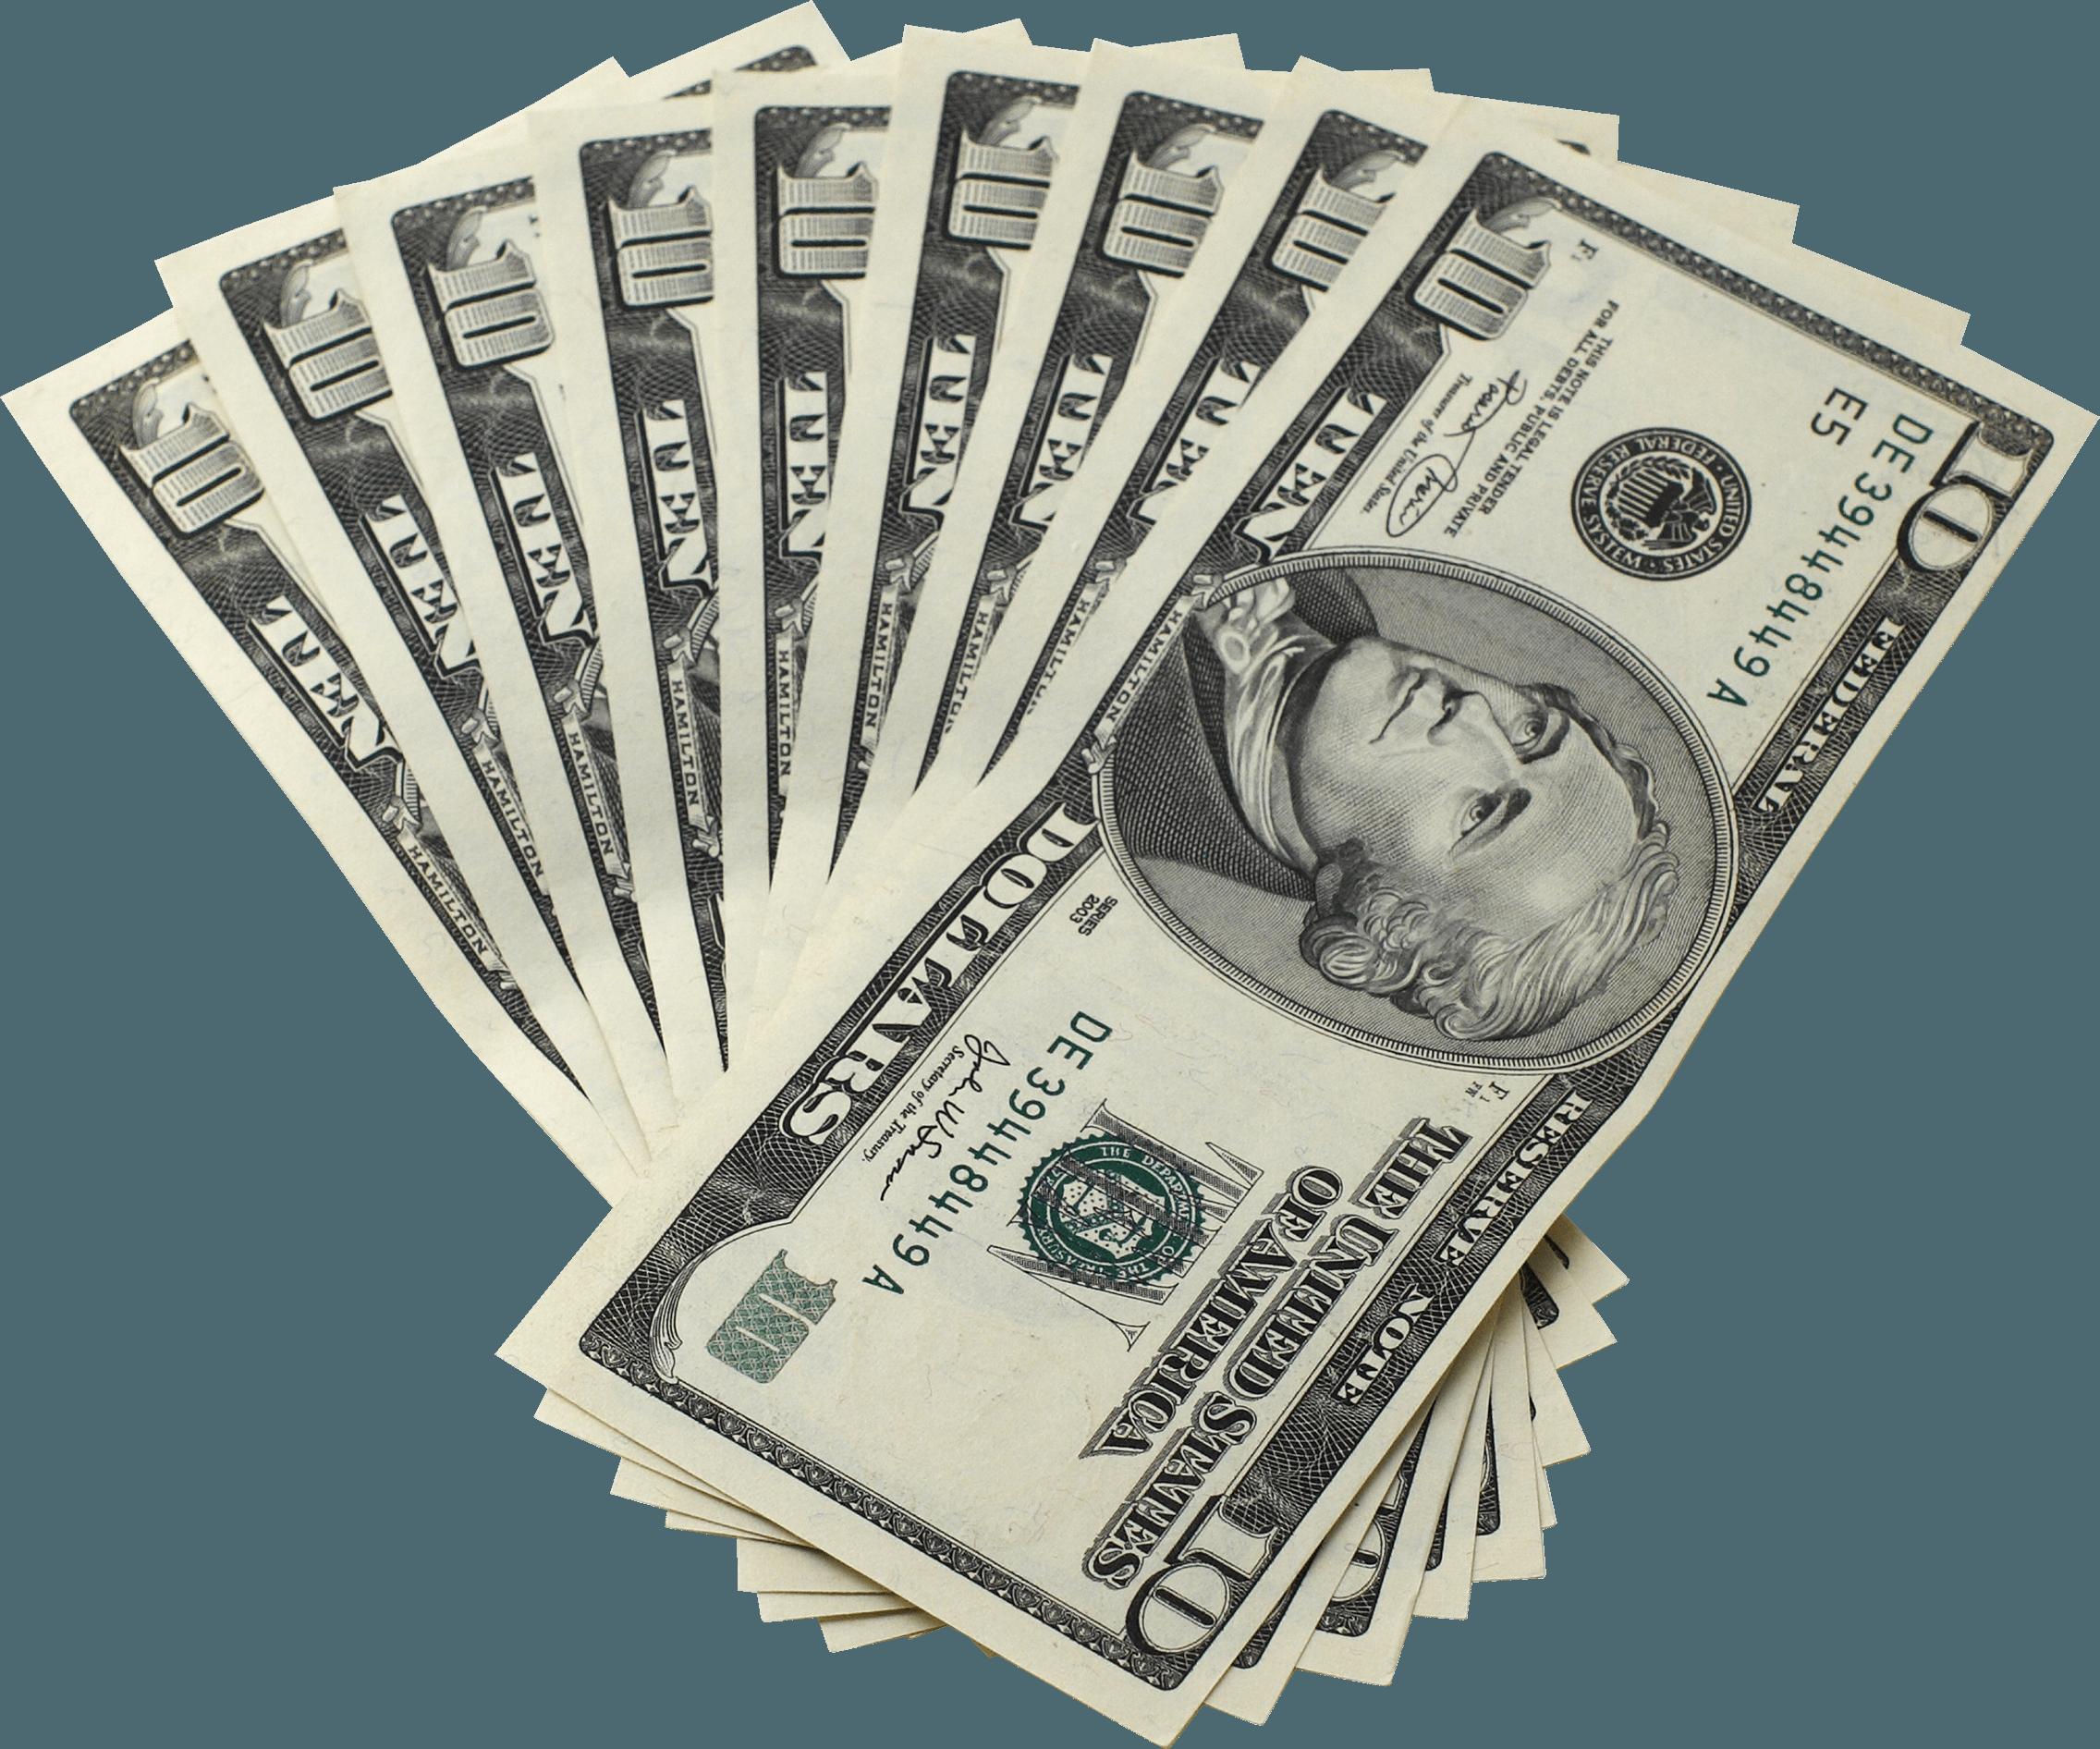 Download Dollars Png Image HQ PNG Image | FreePNGImg